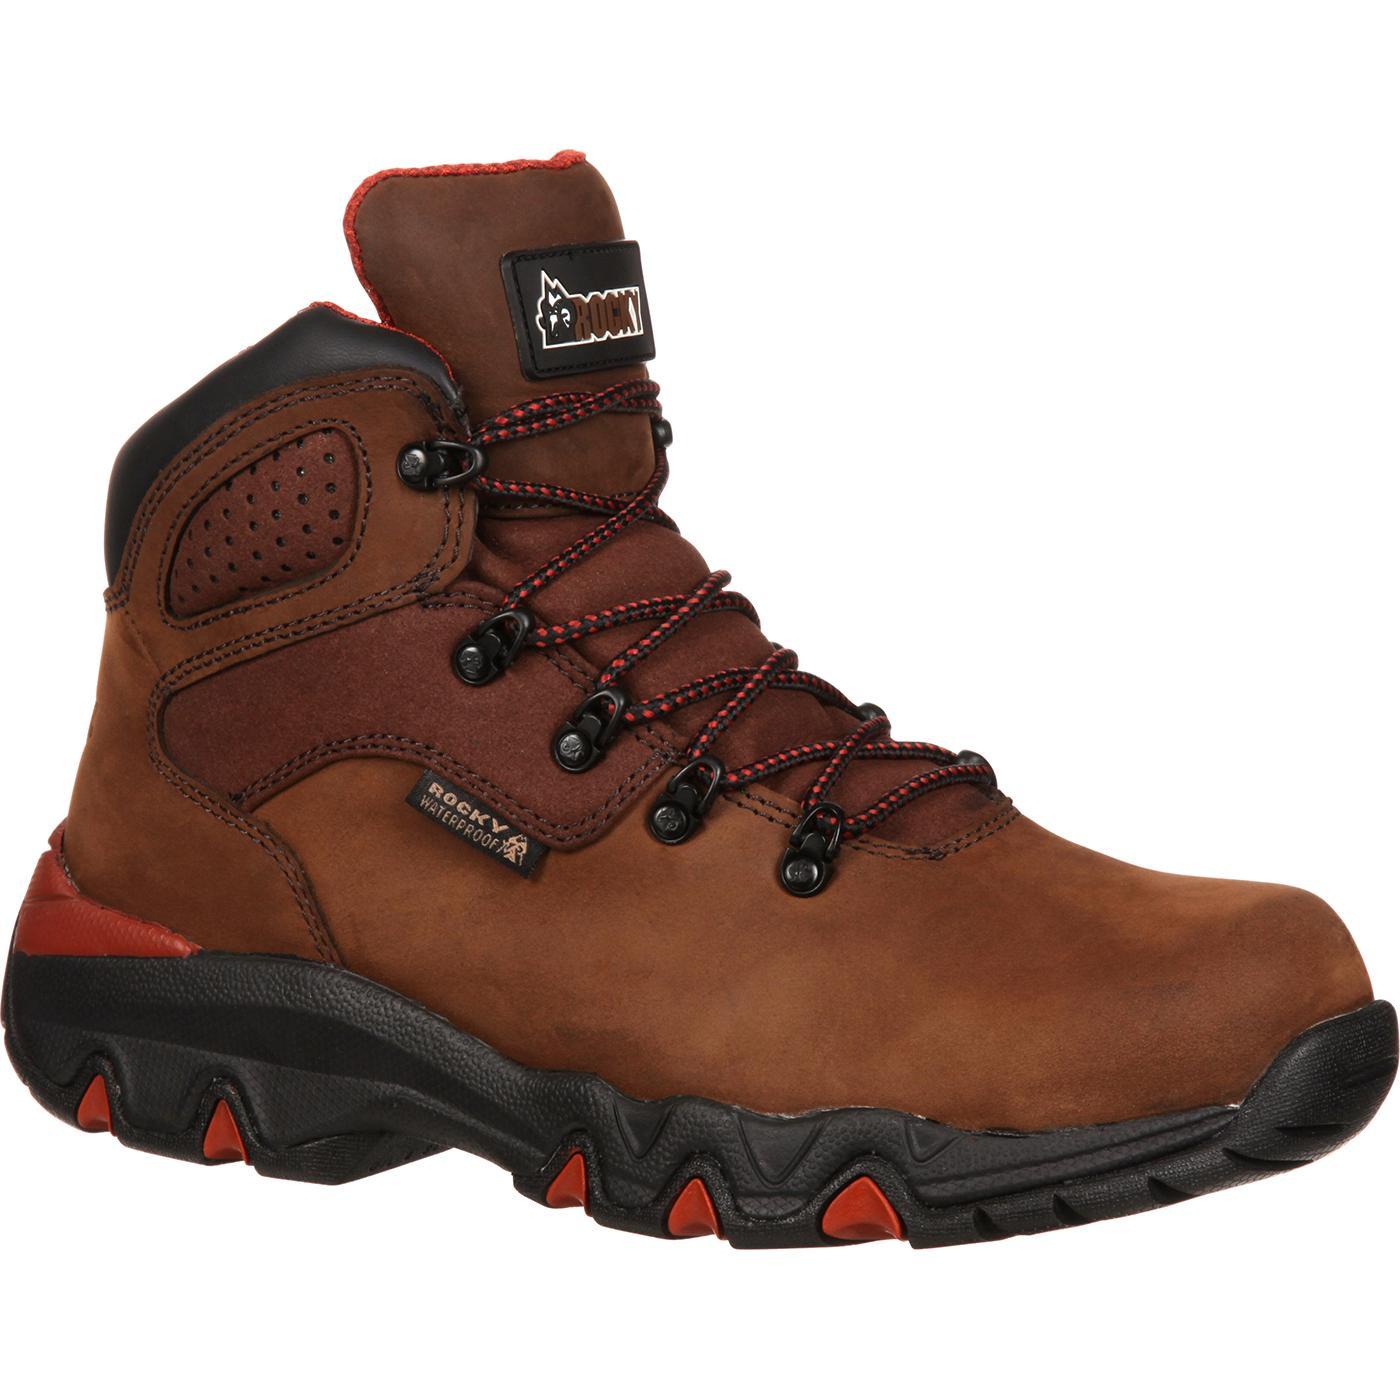 Rocky Bigfoot Steel Toe Waterproof Hiker Work Boot, RKYK063